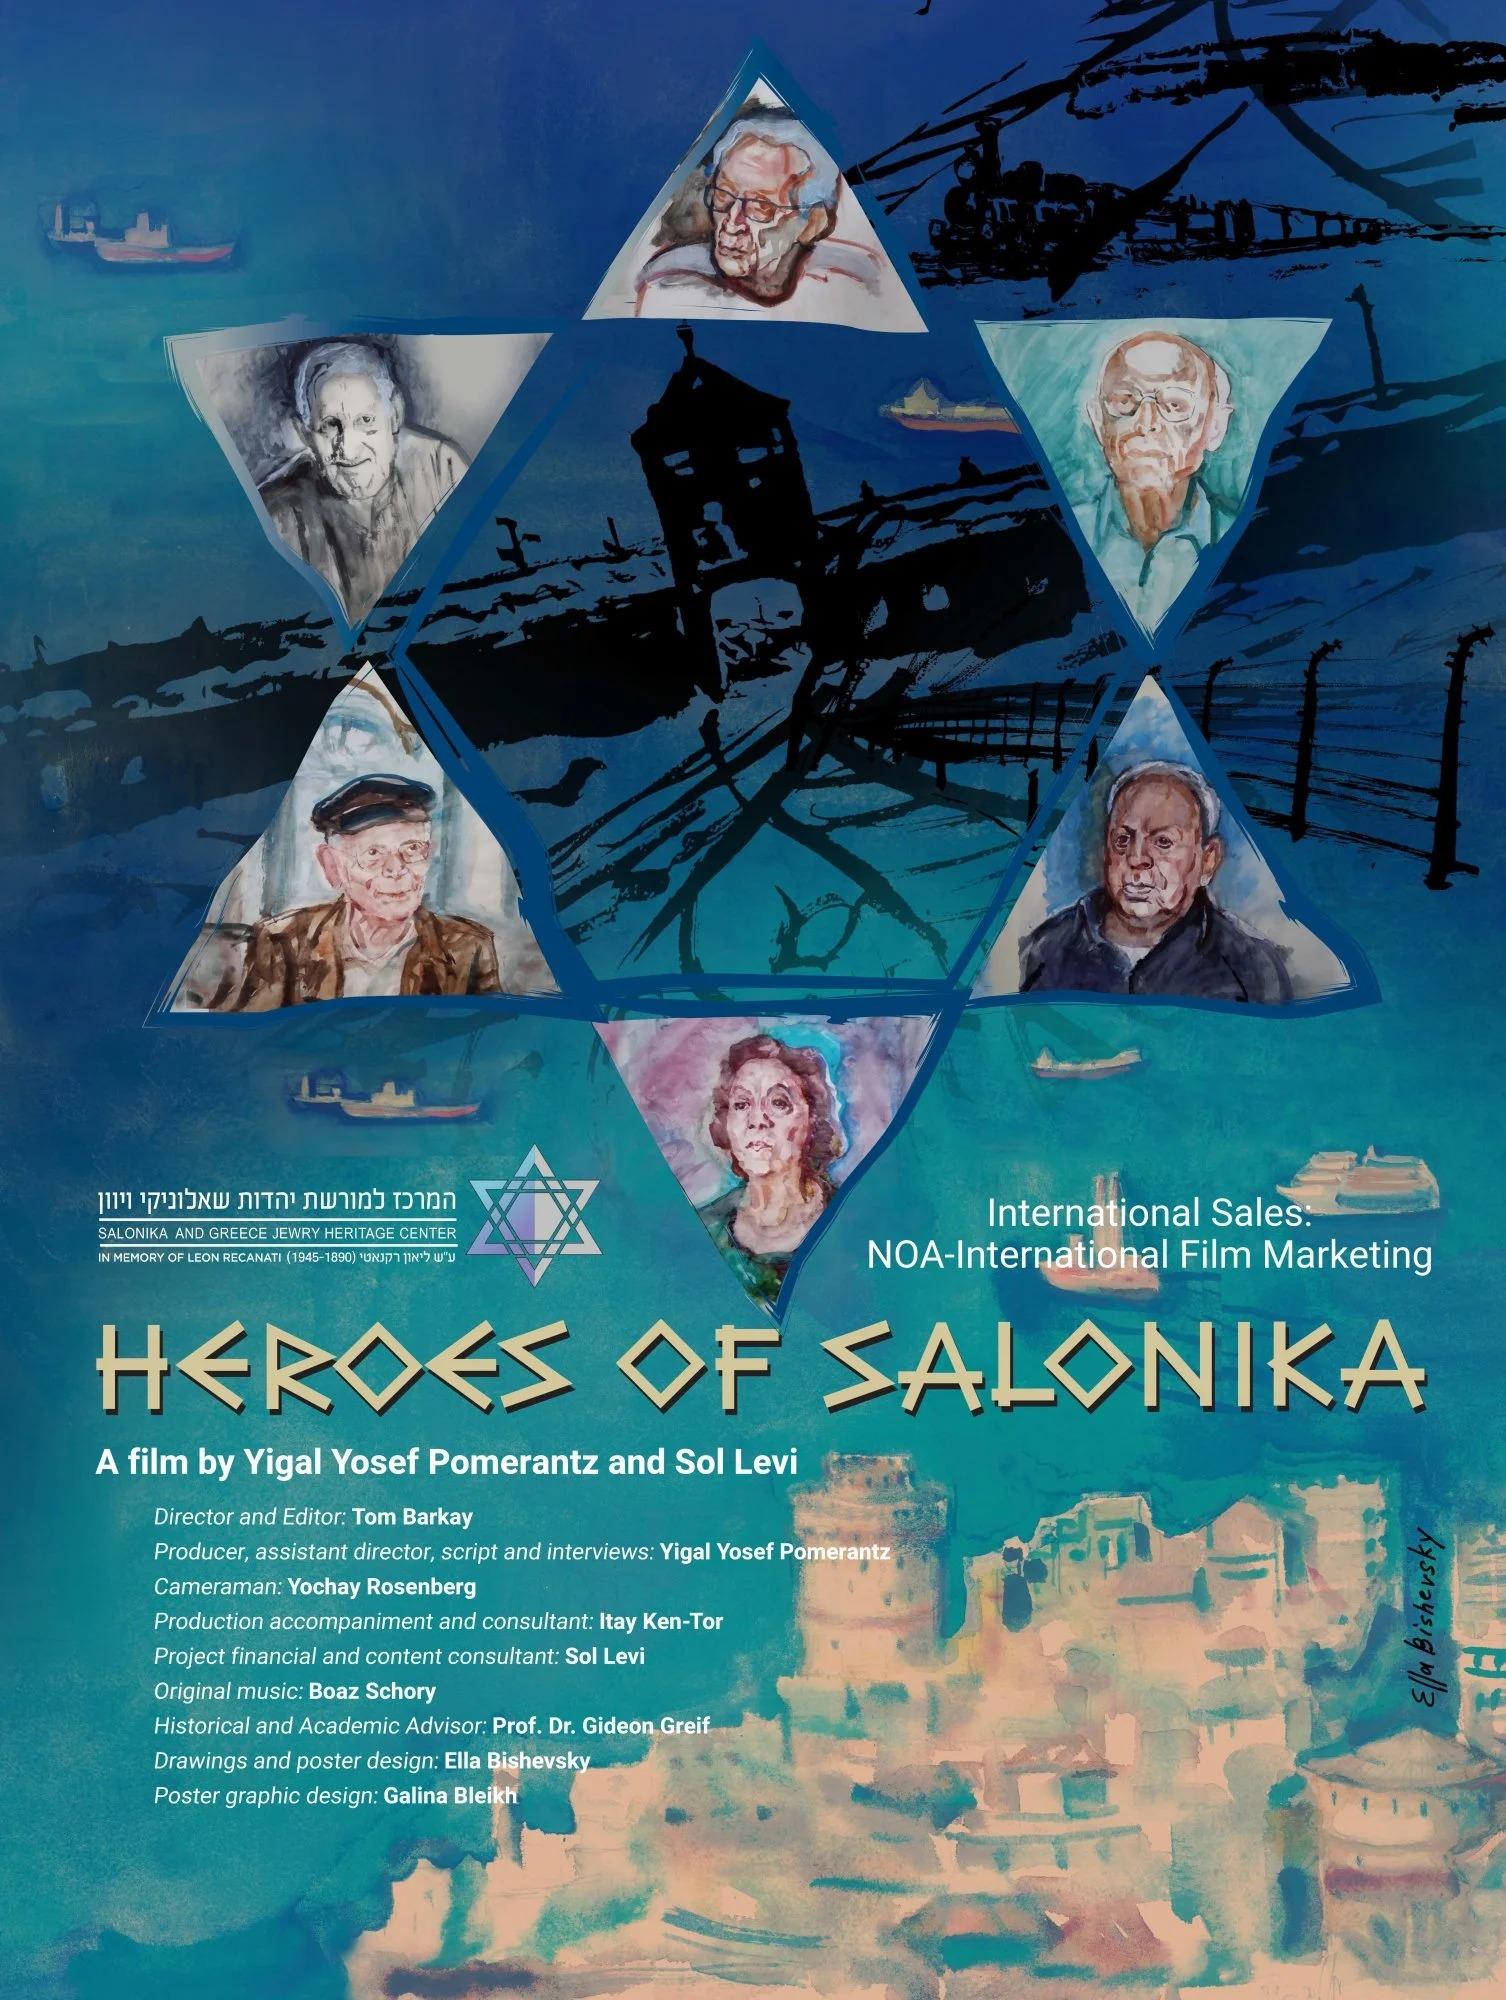 Heros of Salonika Poster